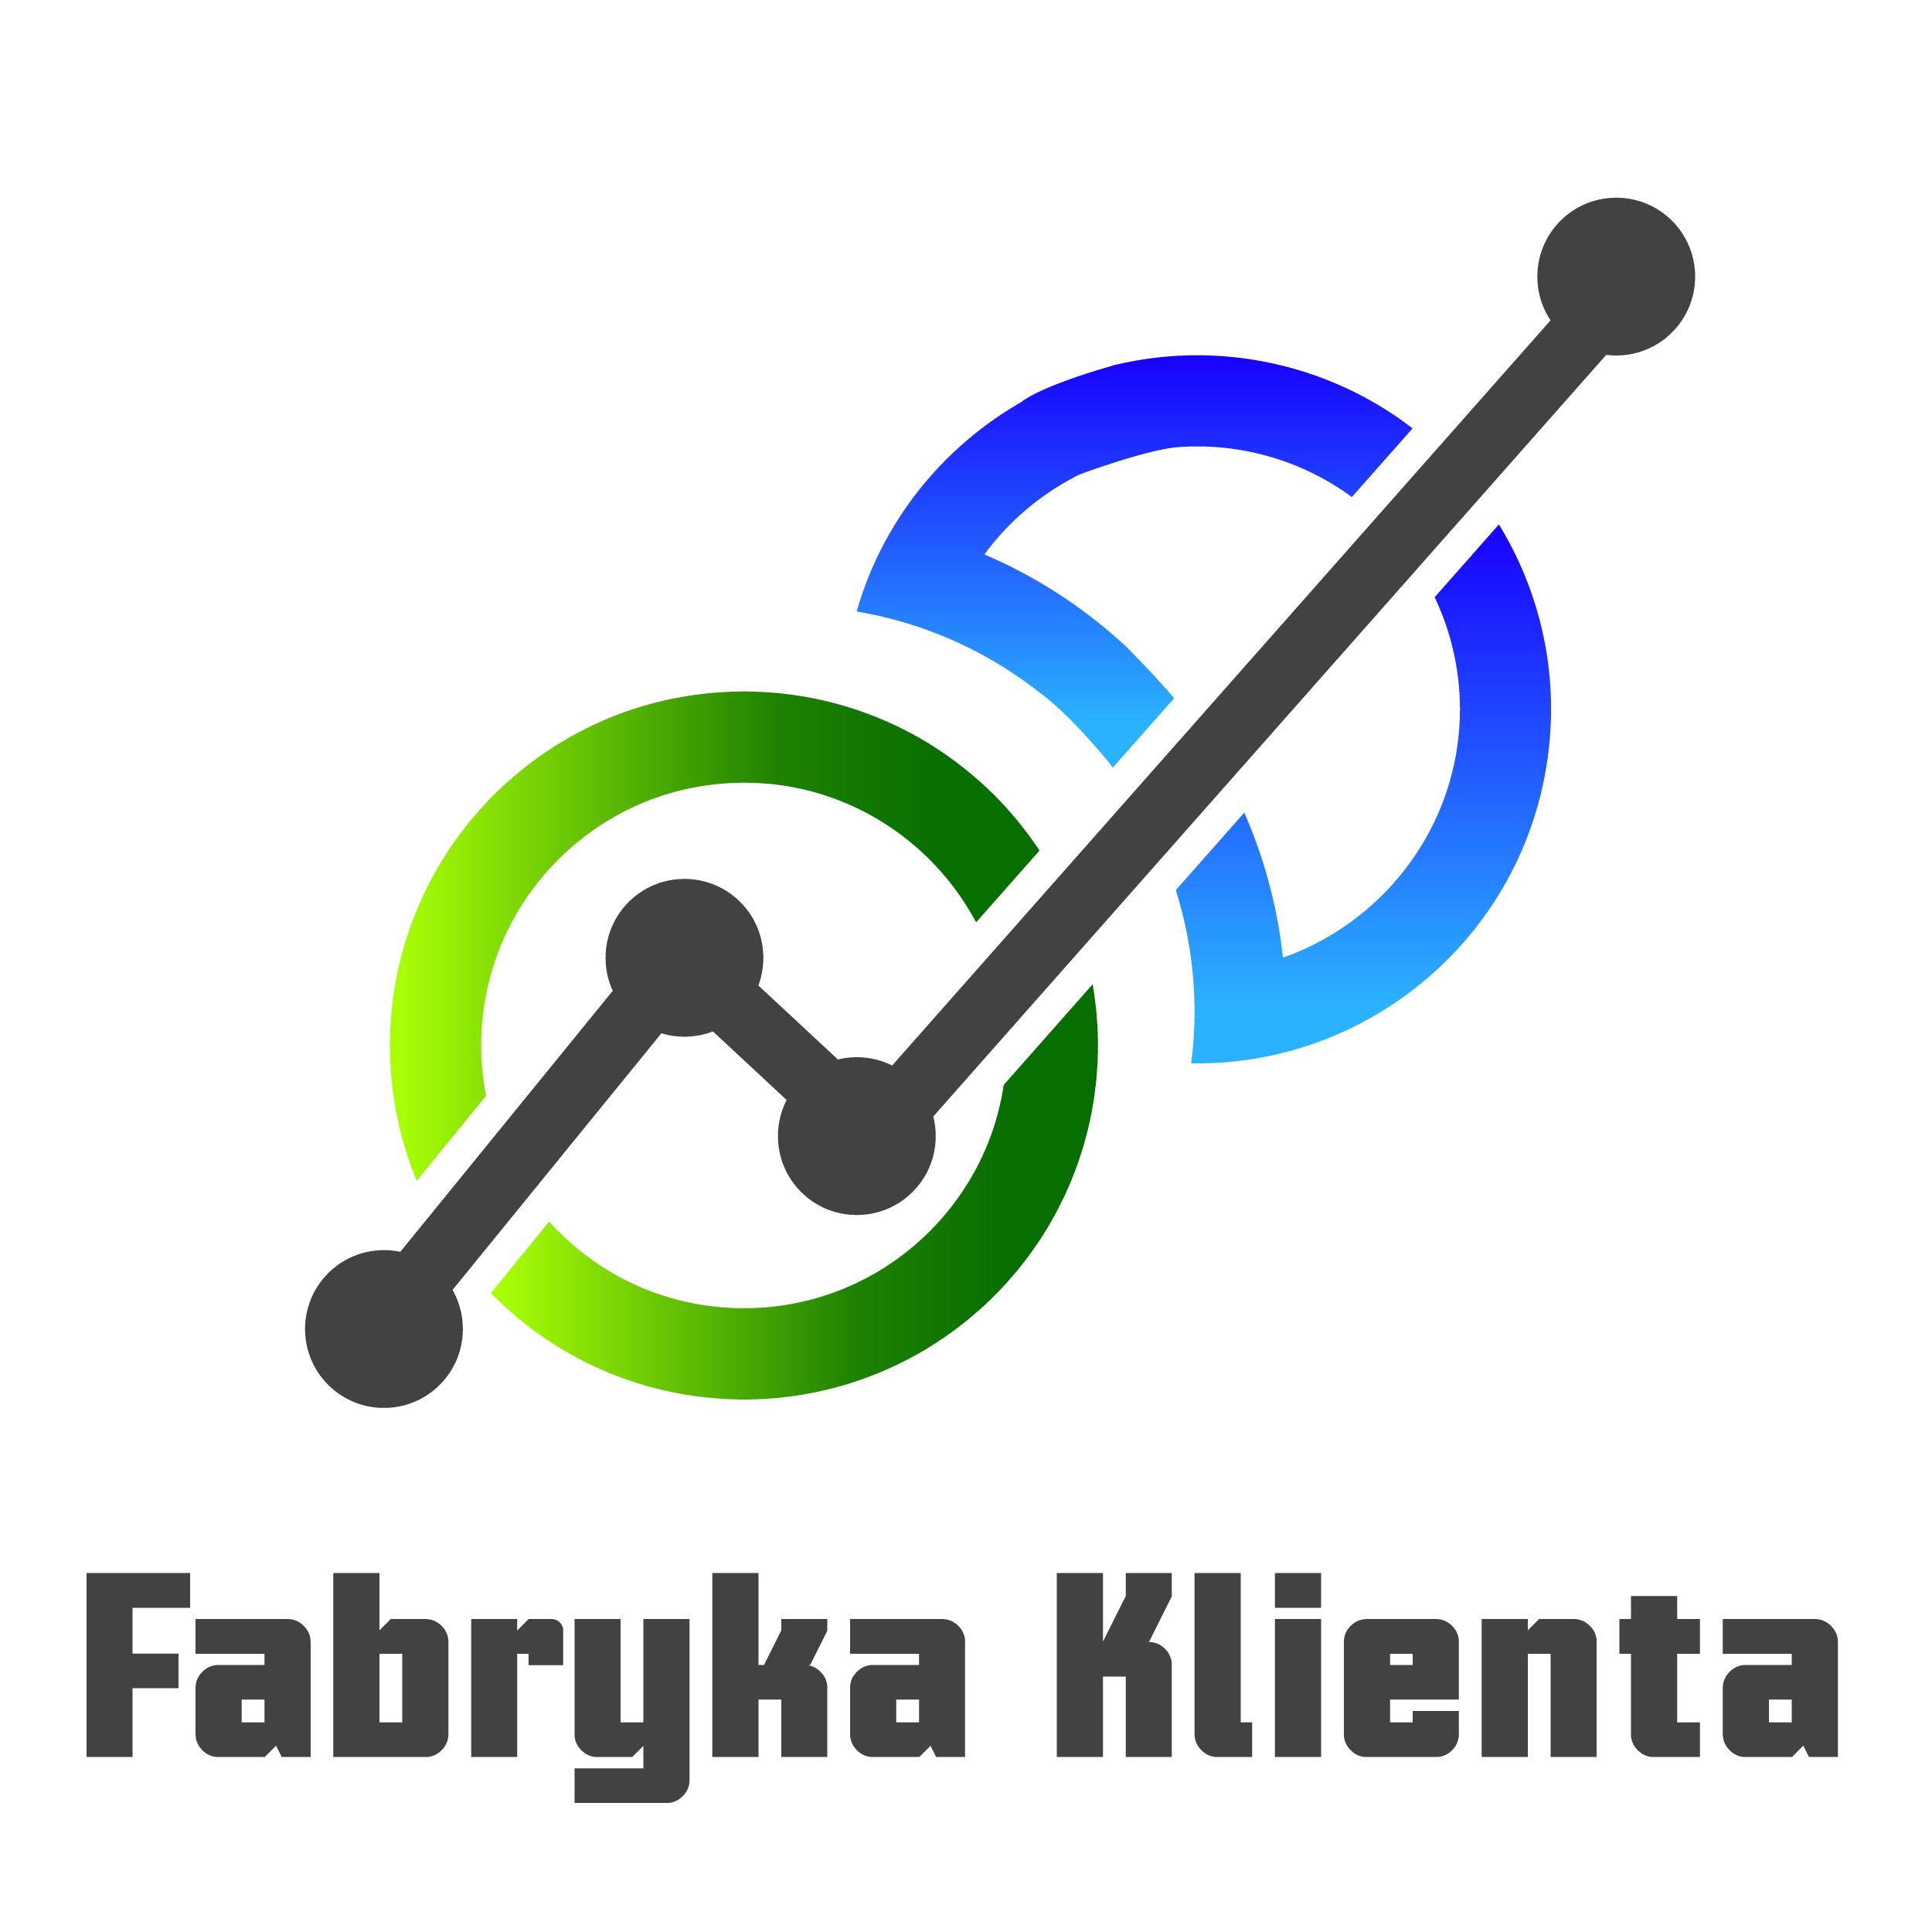 Fabryka Klienta